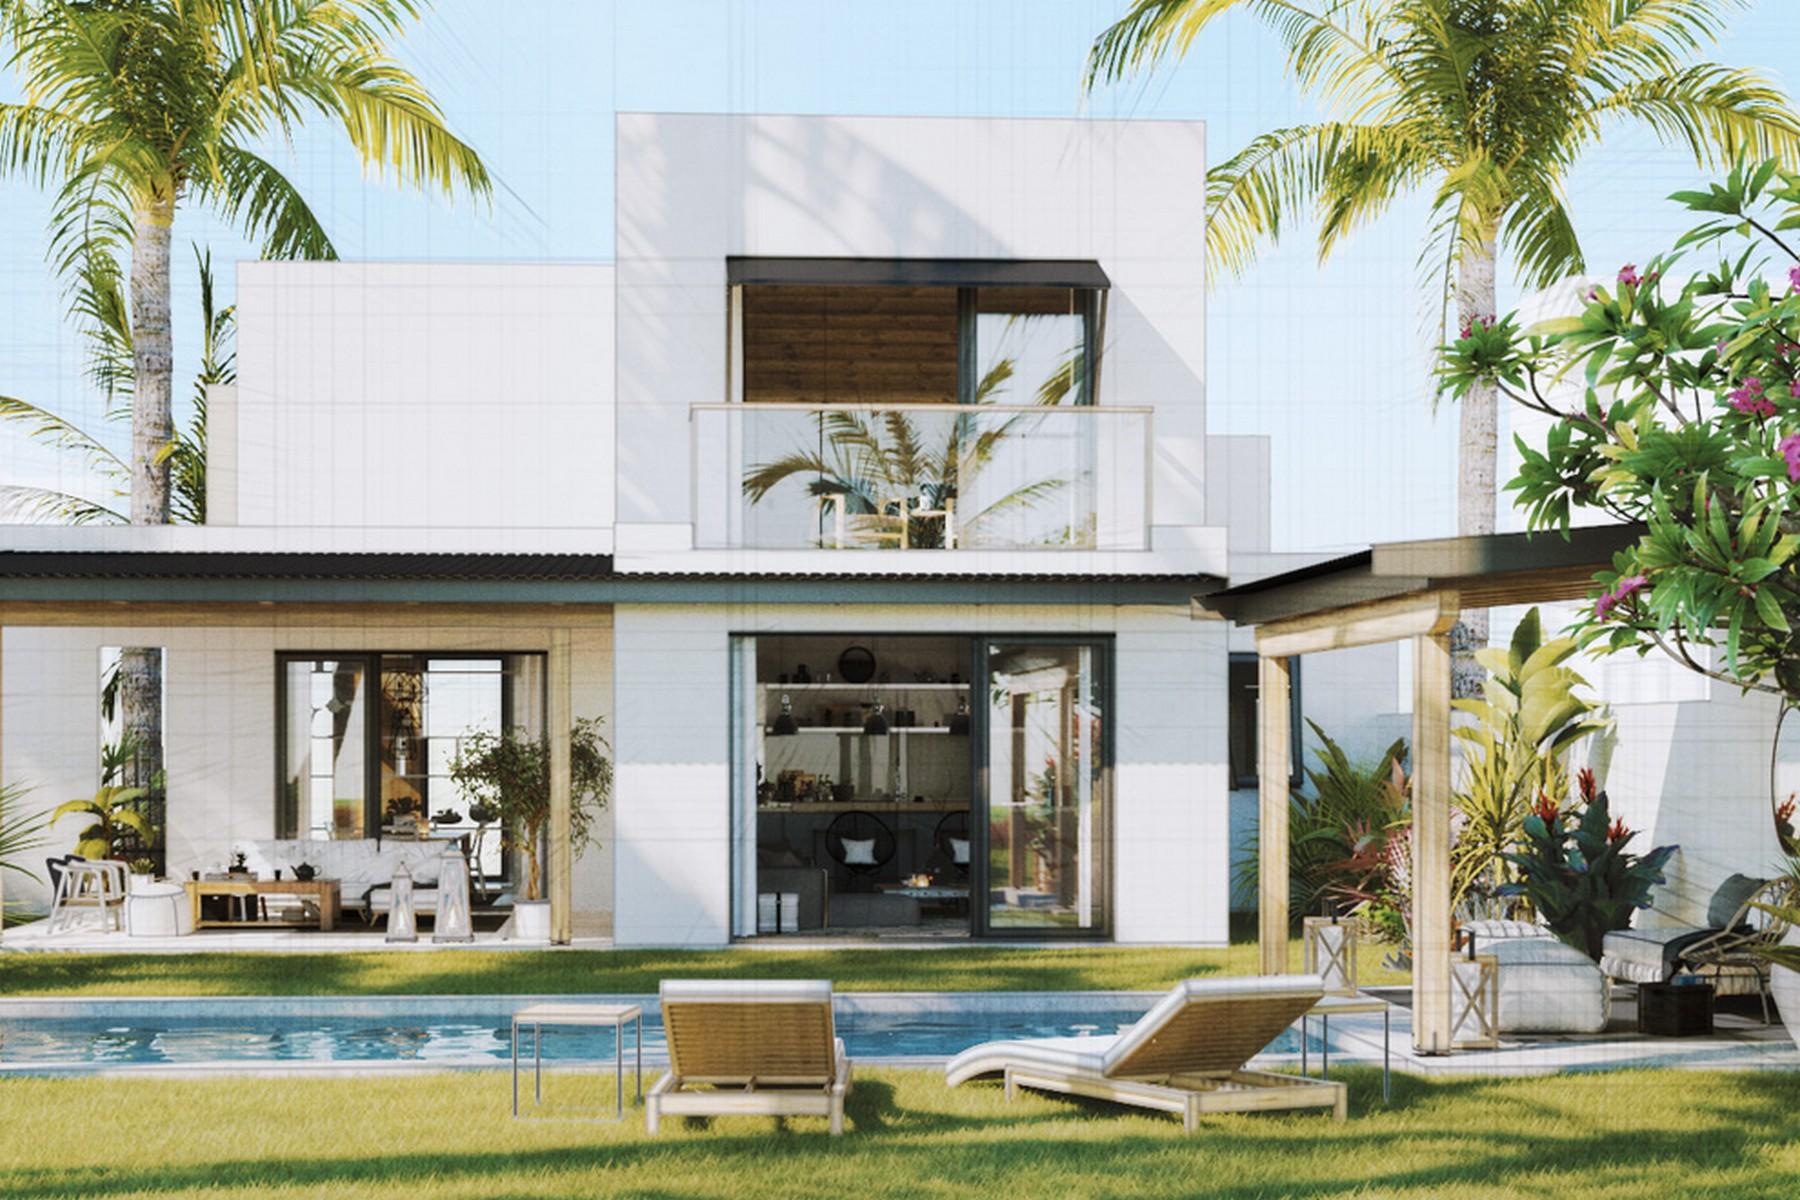 дуплекс для того Продажа на Ennéa Villa - Azuri Roches Noires, Riviere Du Rempart, Маврикий